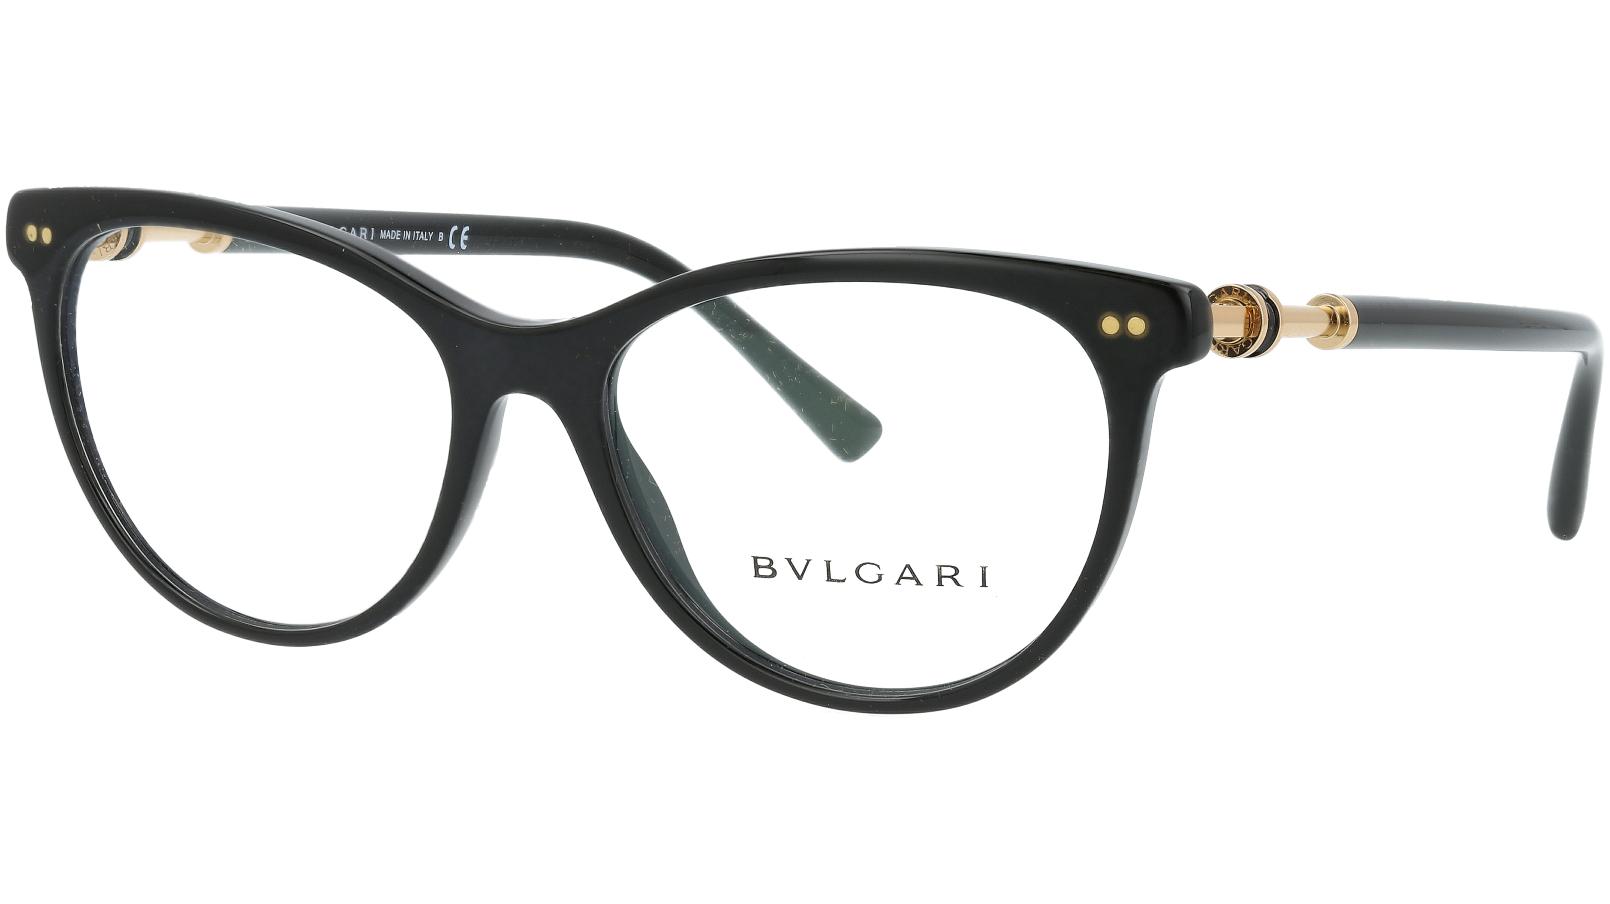 BVLGARI BV4174 501 54 BLACK Glasses